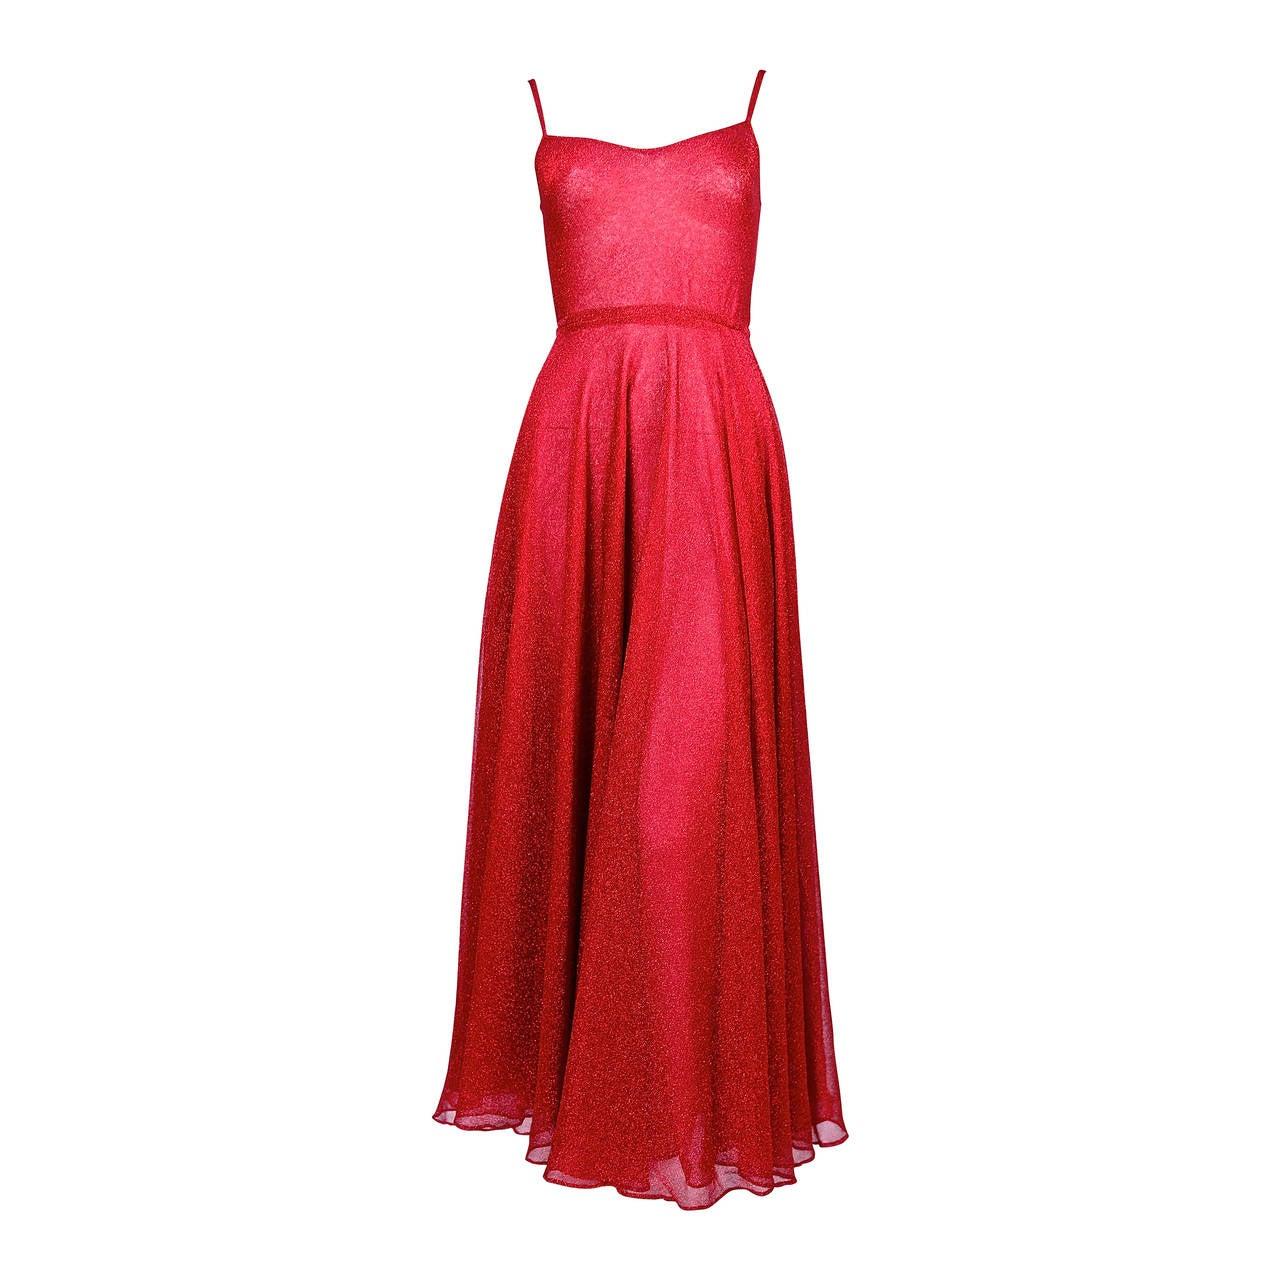 Halston fuchsia lurex dress, 1970s  For Sale